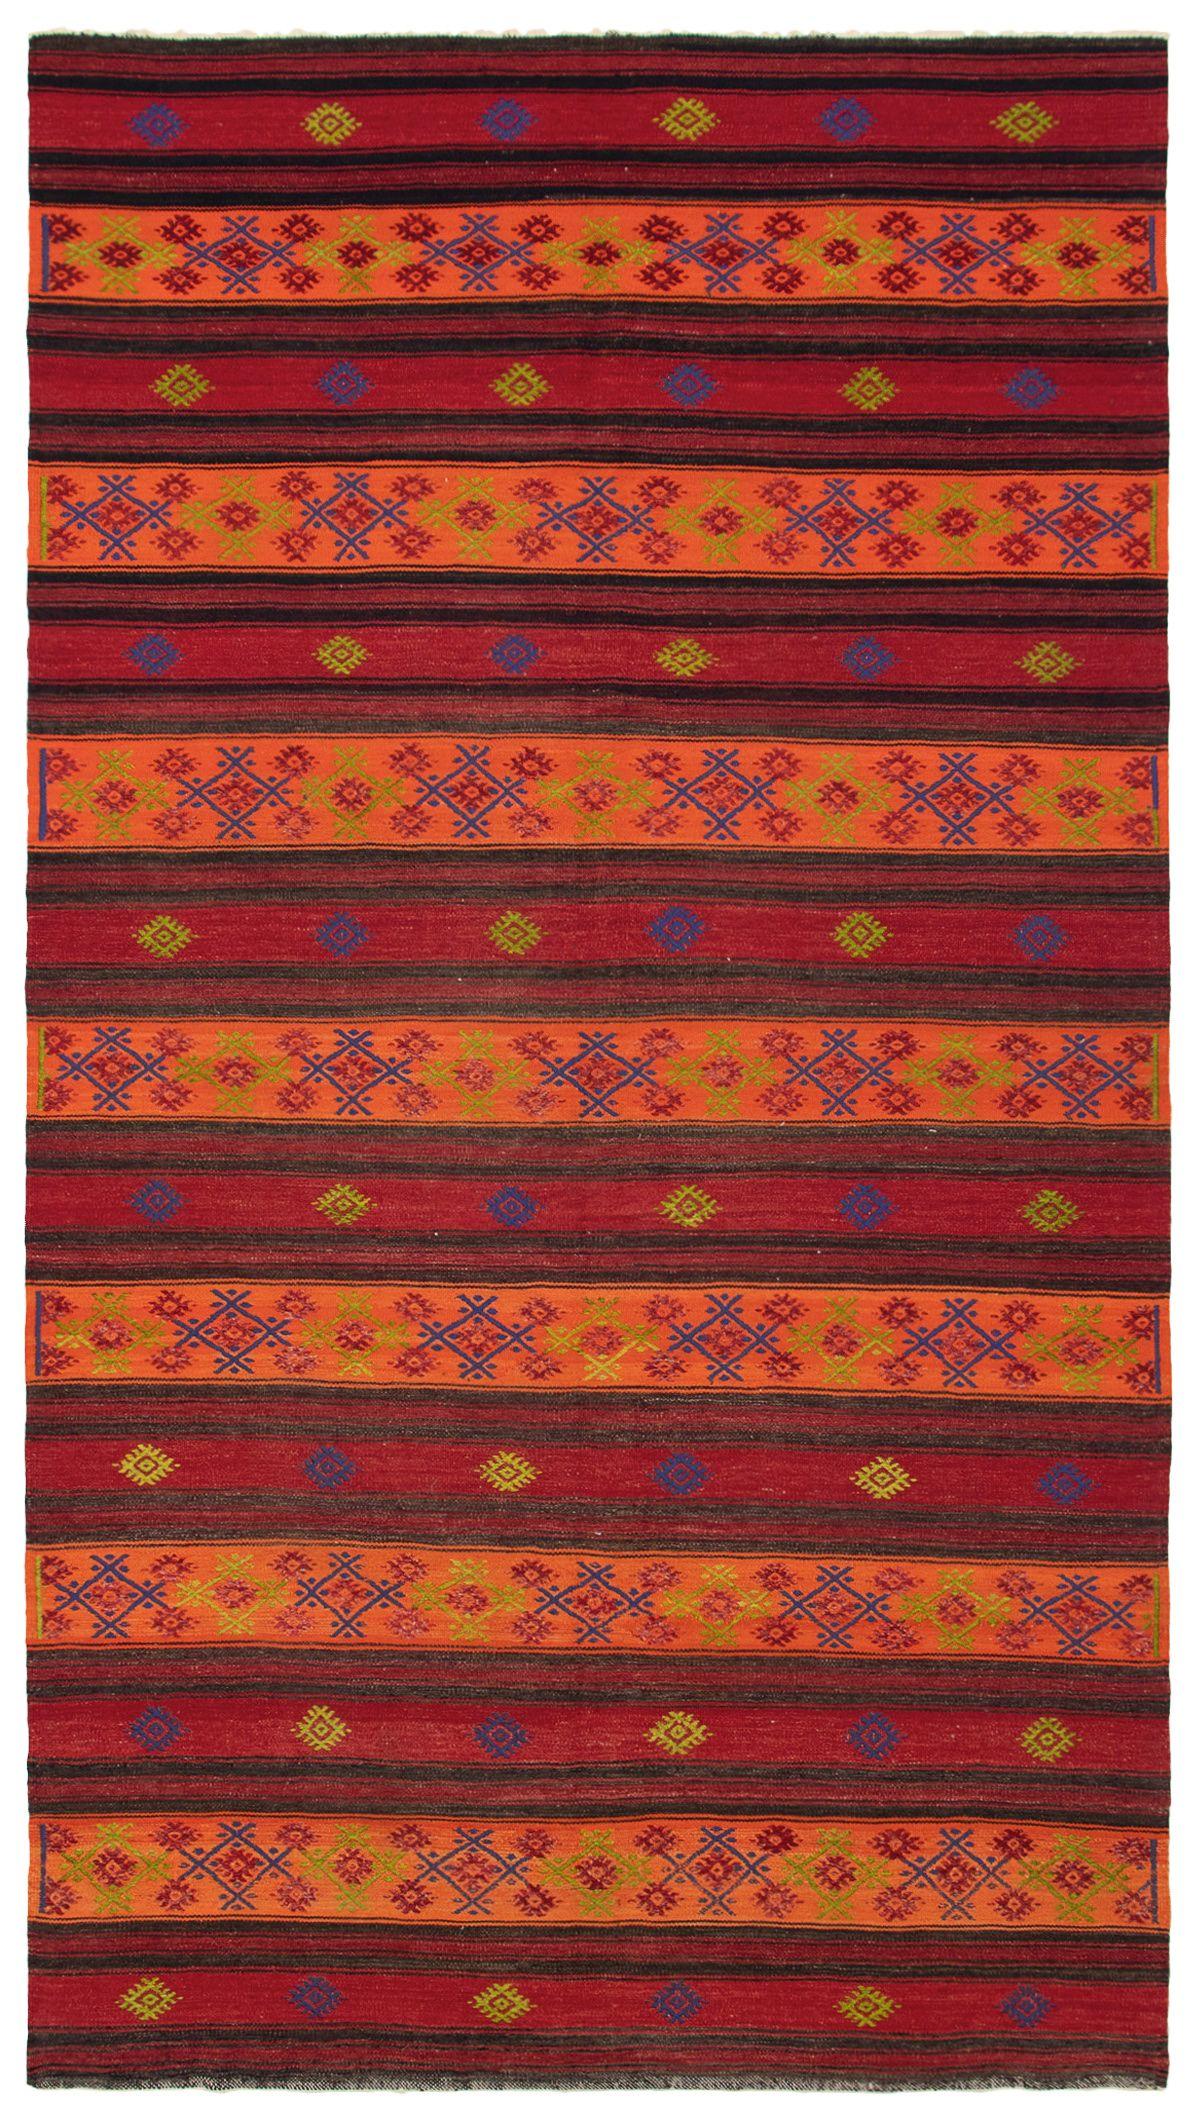 "Hand woven Yoruk Dark Red, Orange Wool Kilim 5'10"" x 10'9"" Size: 5'10"" x 10'9"""